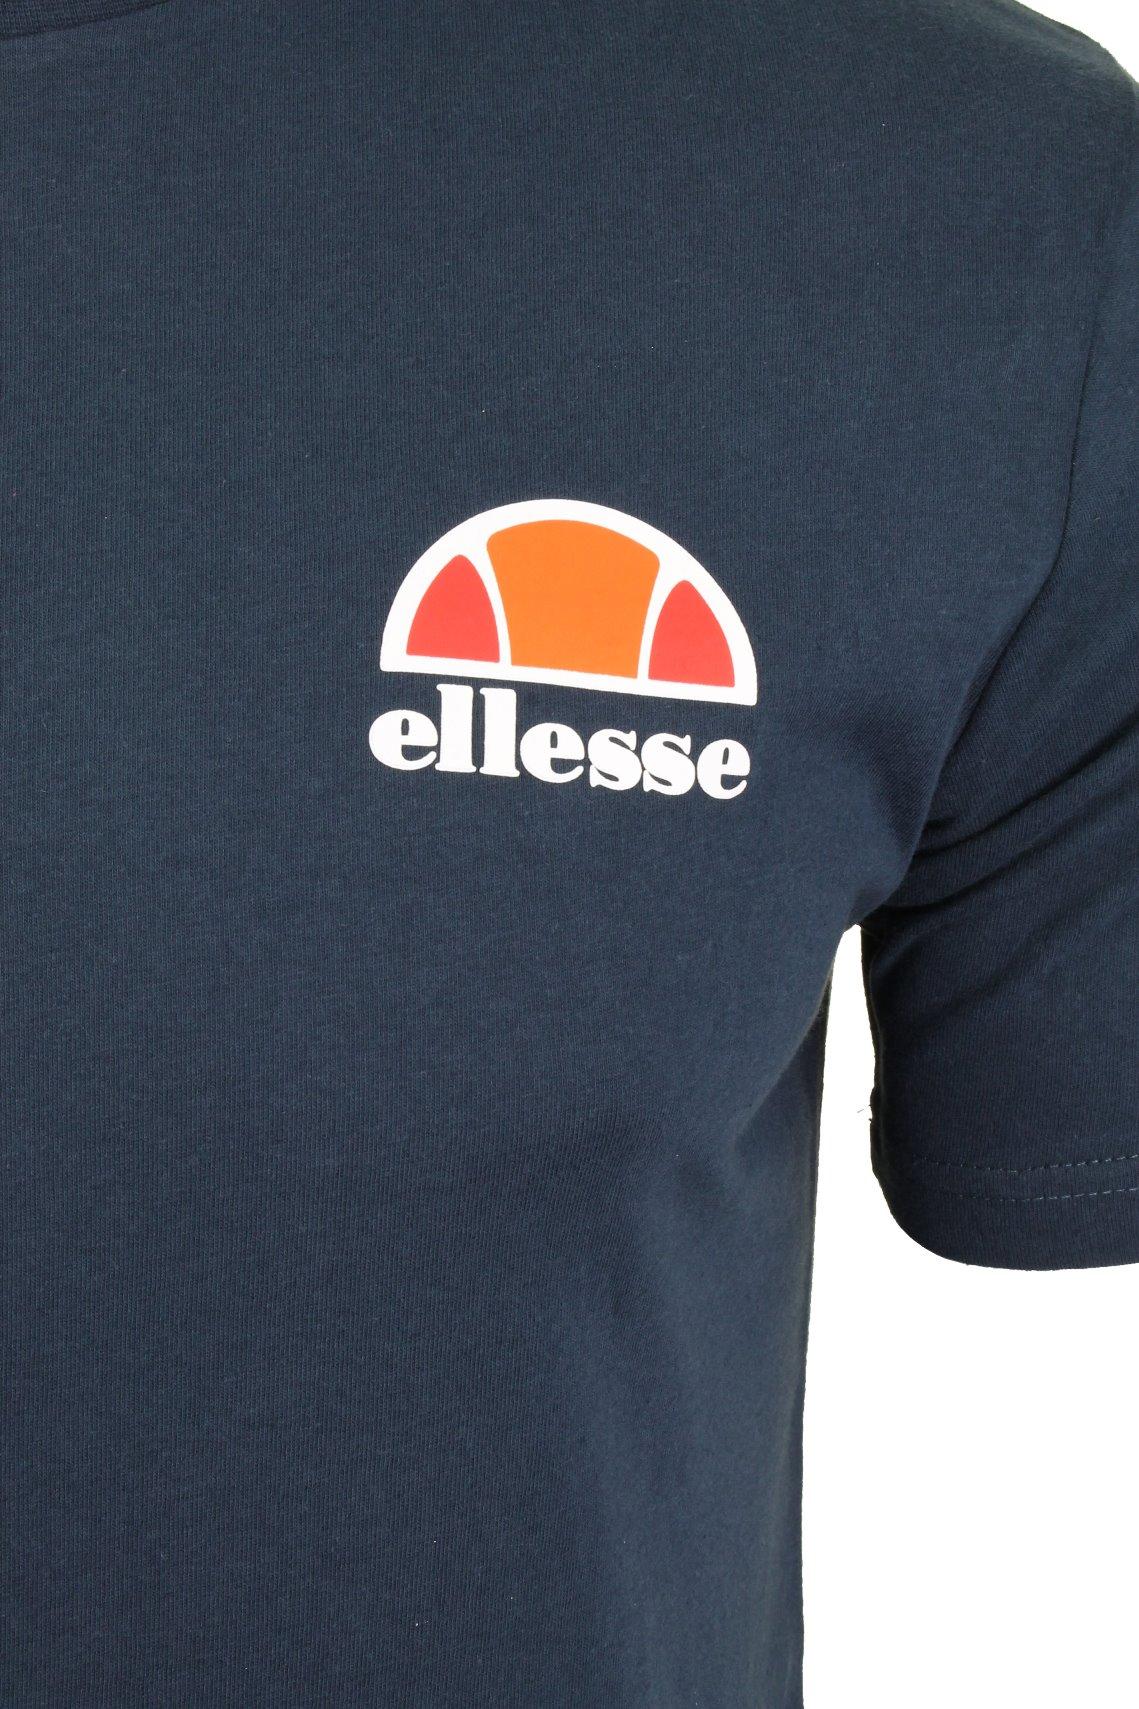 Para-Hombre-Ellesse-Camiseta-de-manga-corta-039-Canaletto-034 miniatura 10